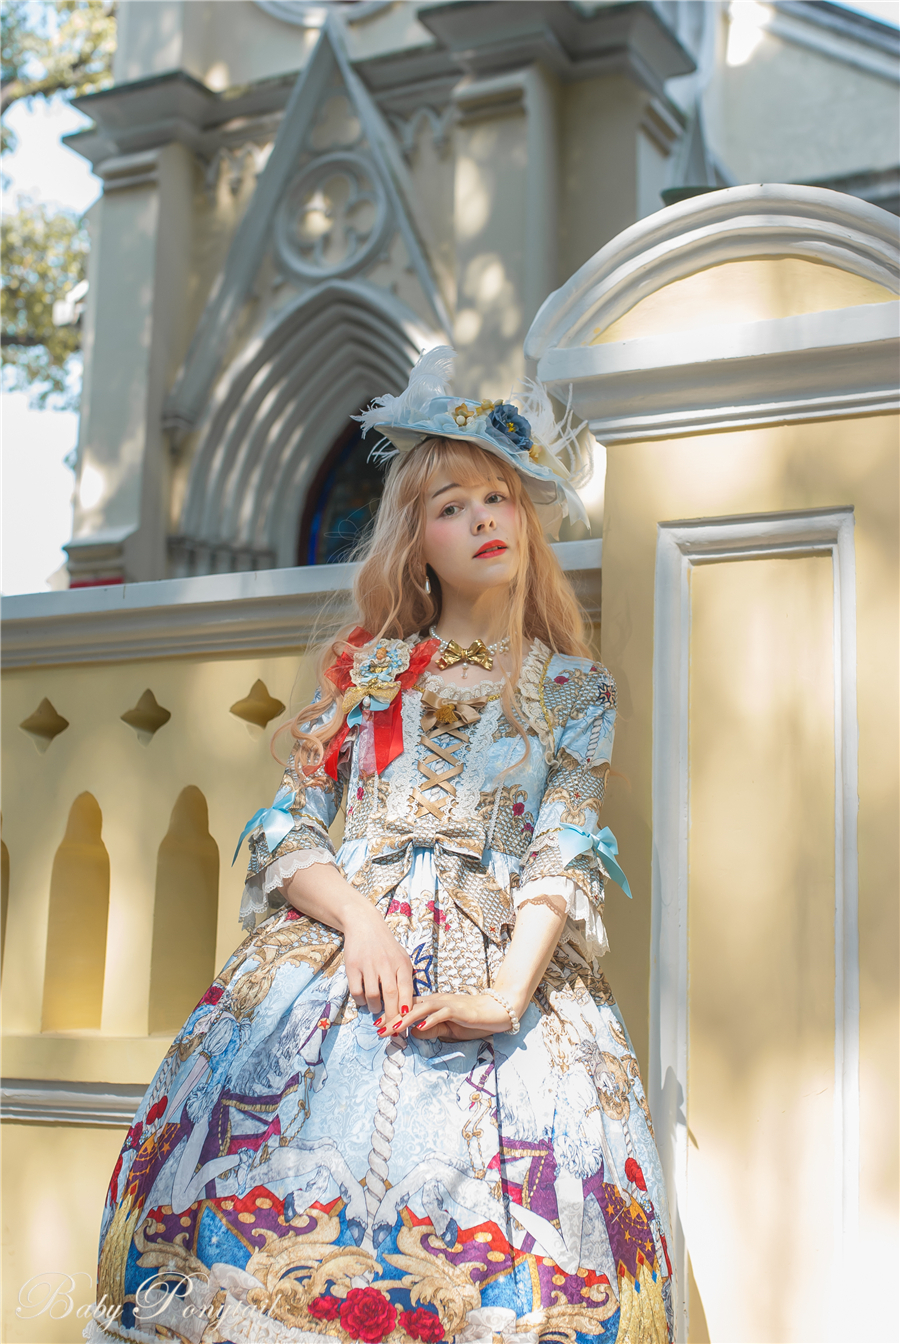 Circus Princess_Sax_OP_Claudia_12.jpg